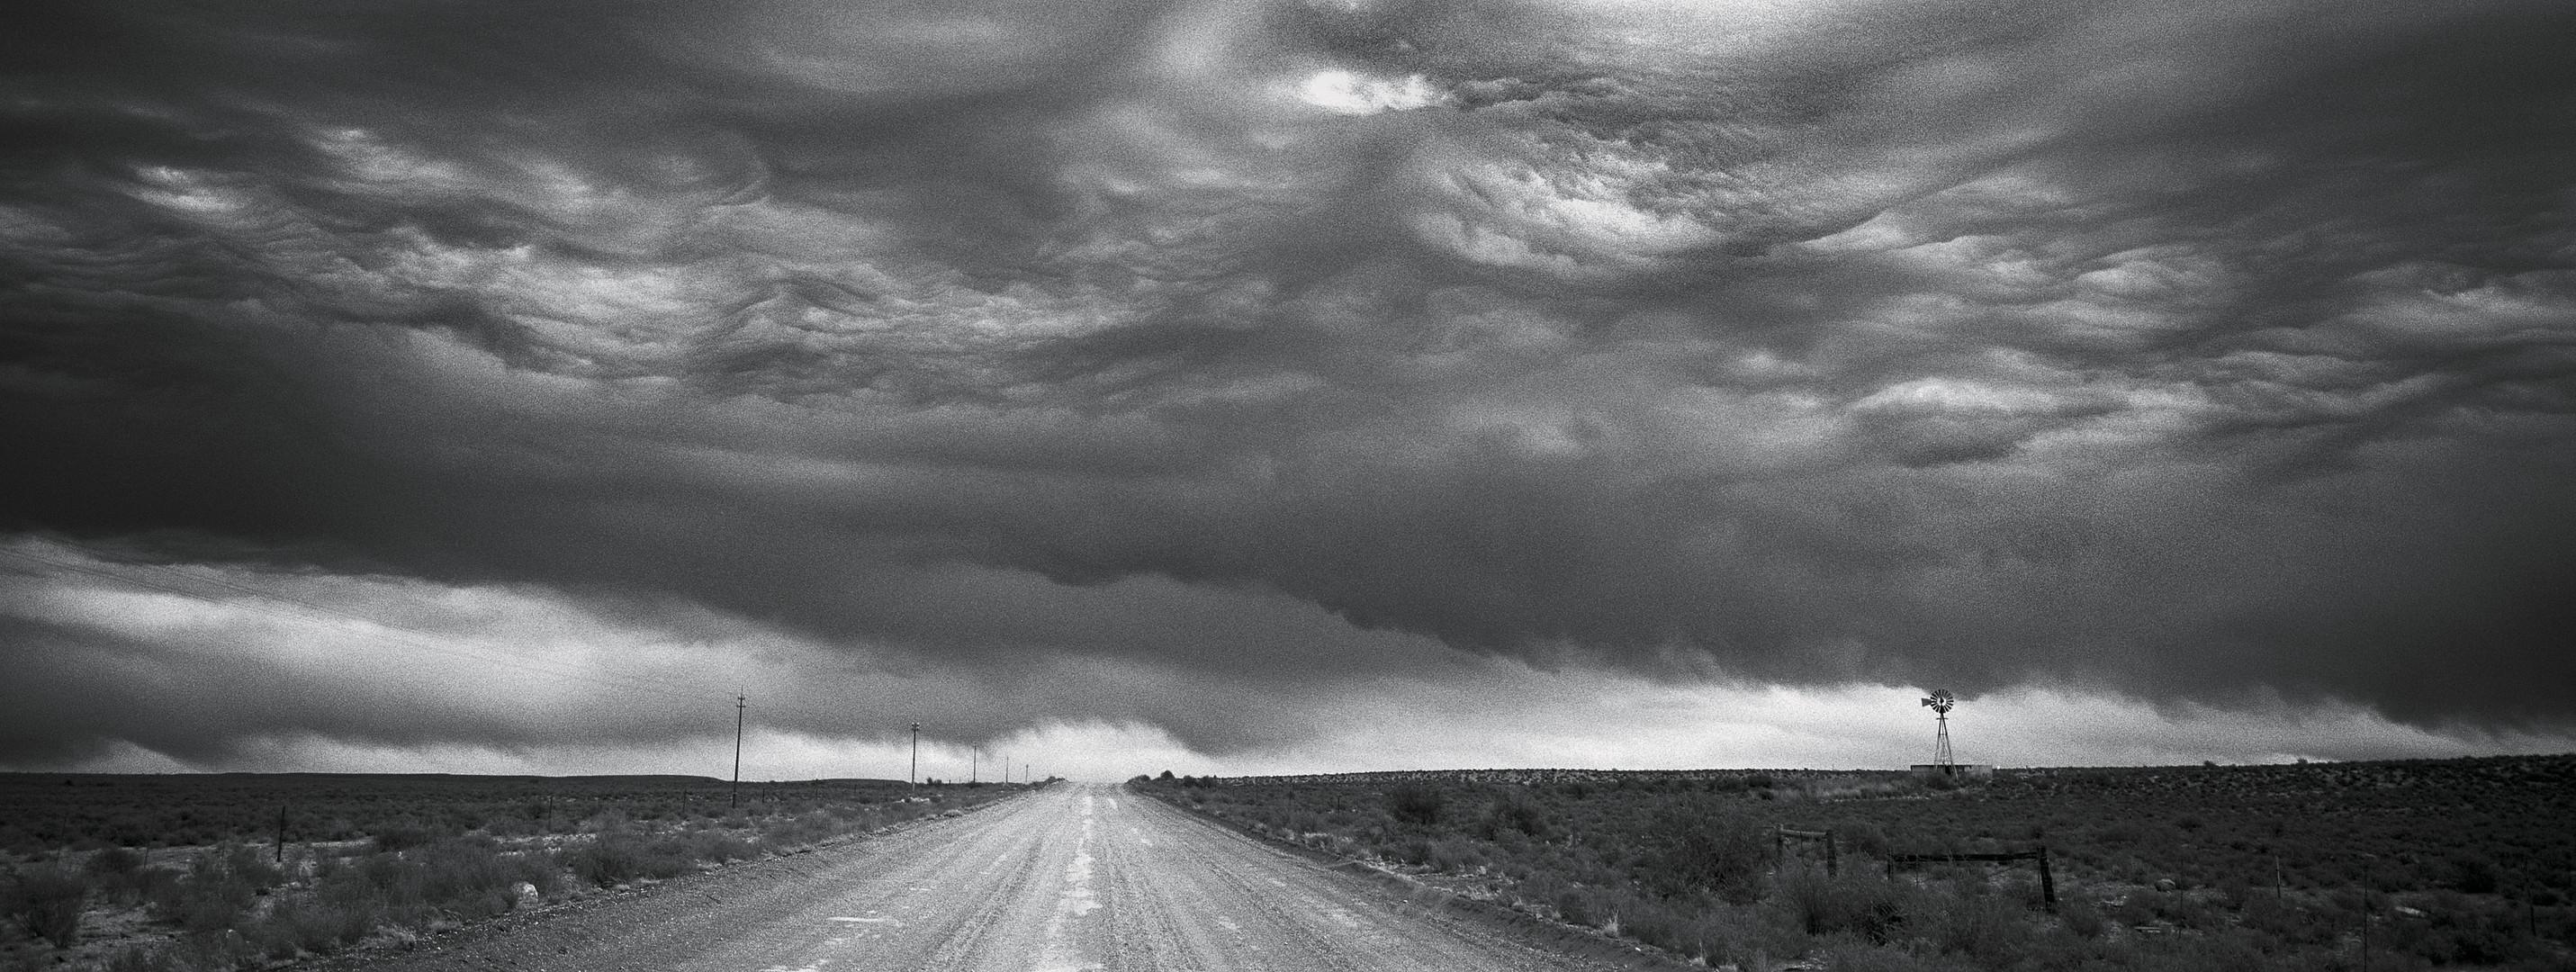 Southern Africa Portfolio-14.jpg